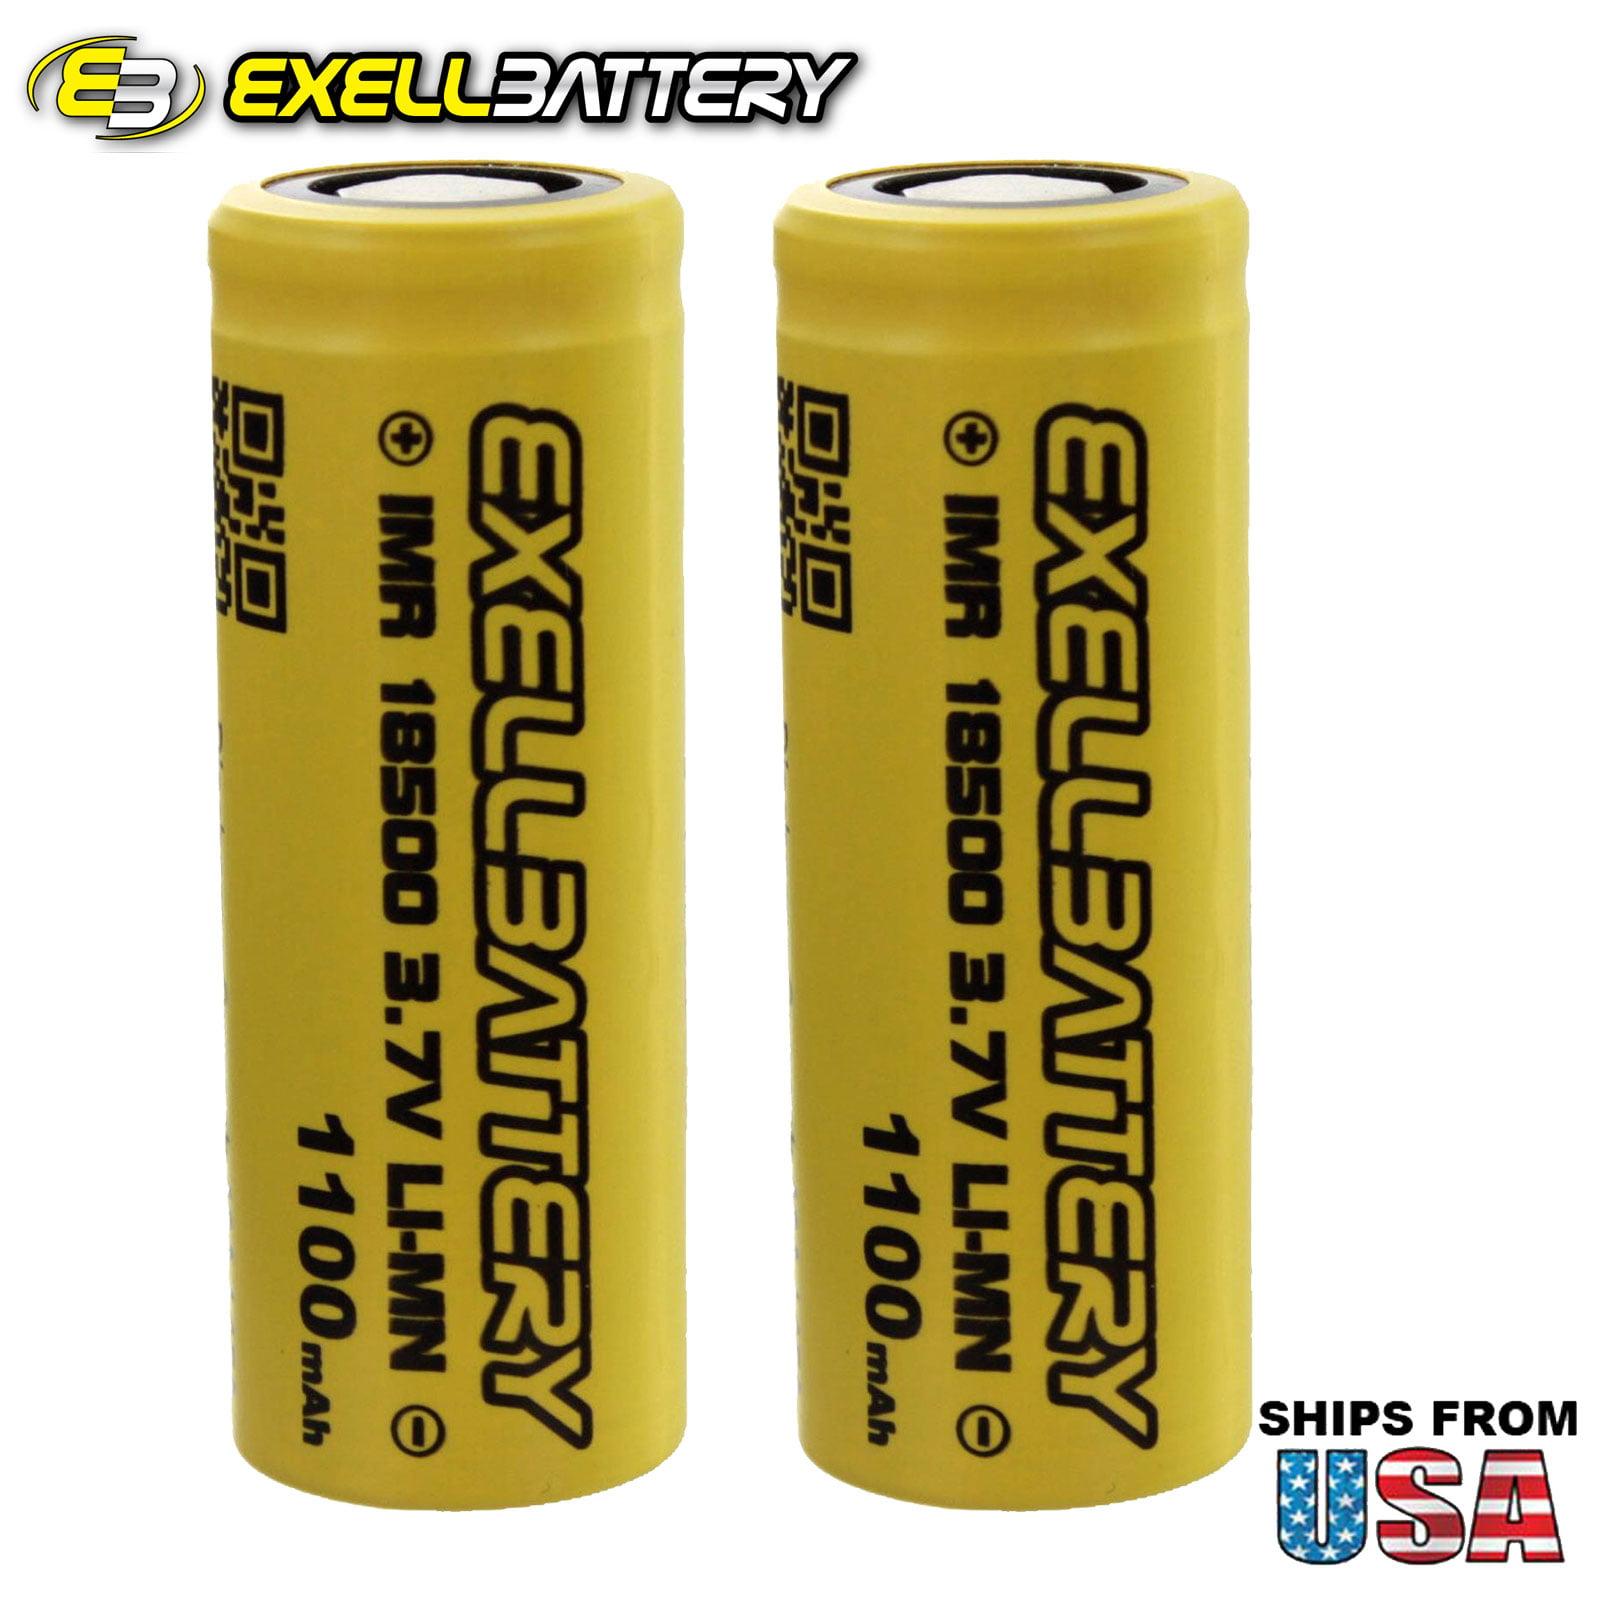 2pc IMR 18500 3.7V LI-MN High Drain 1100mAh 15A Rechargeable Batteries